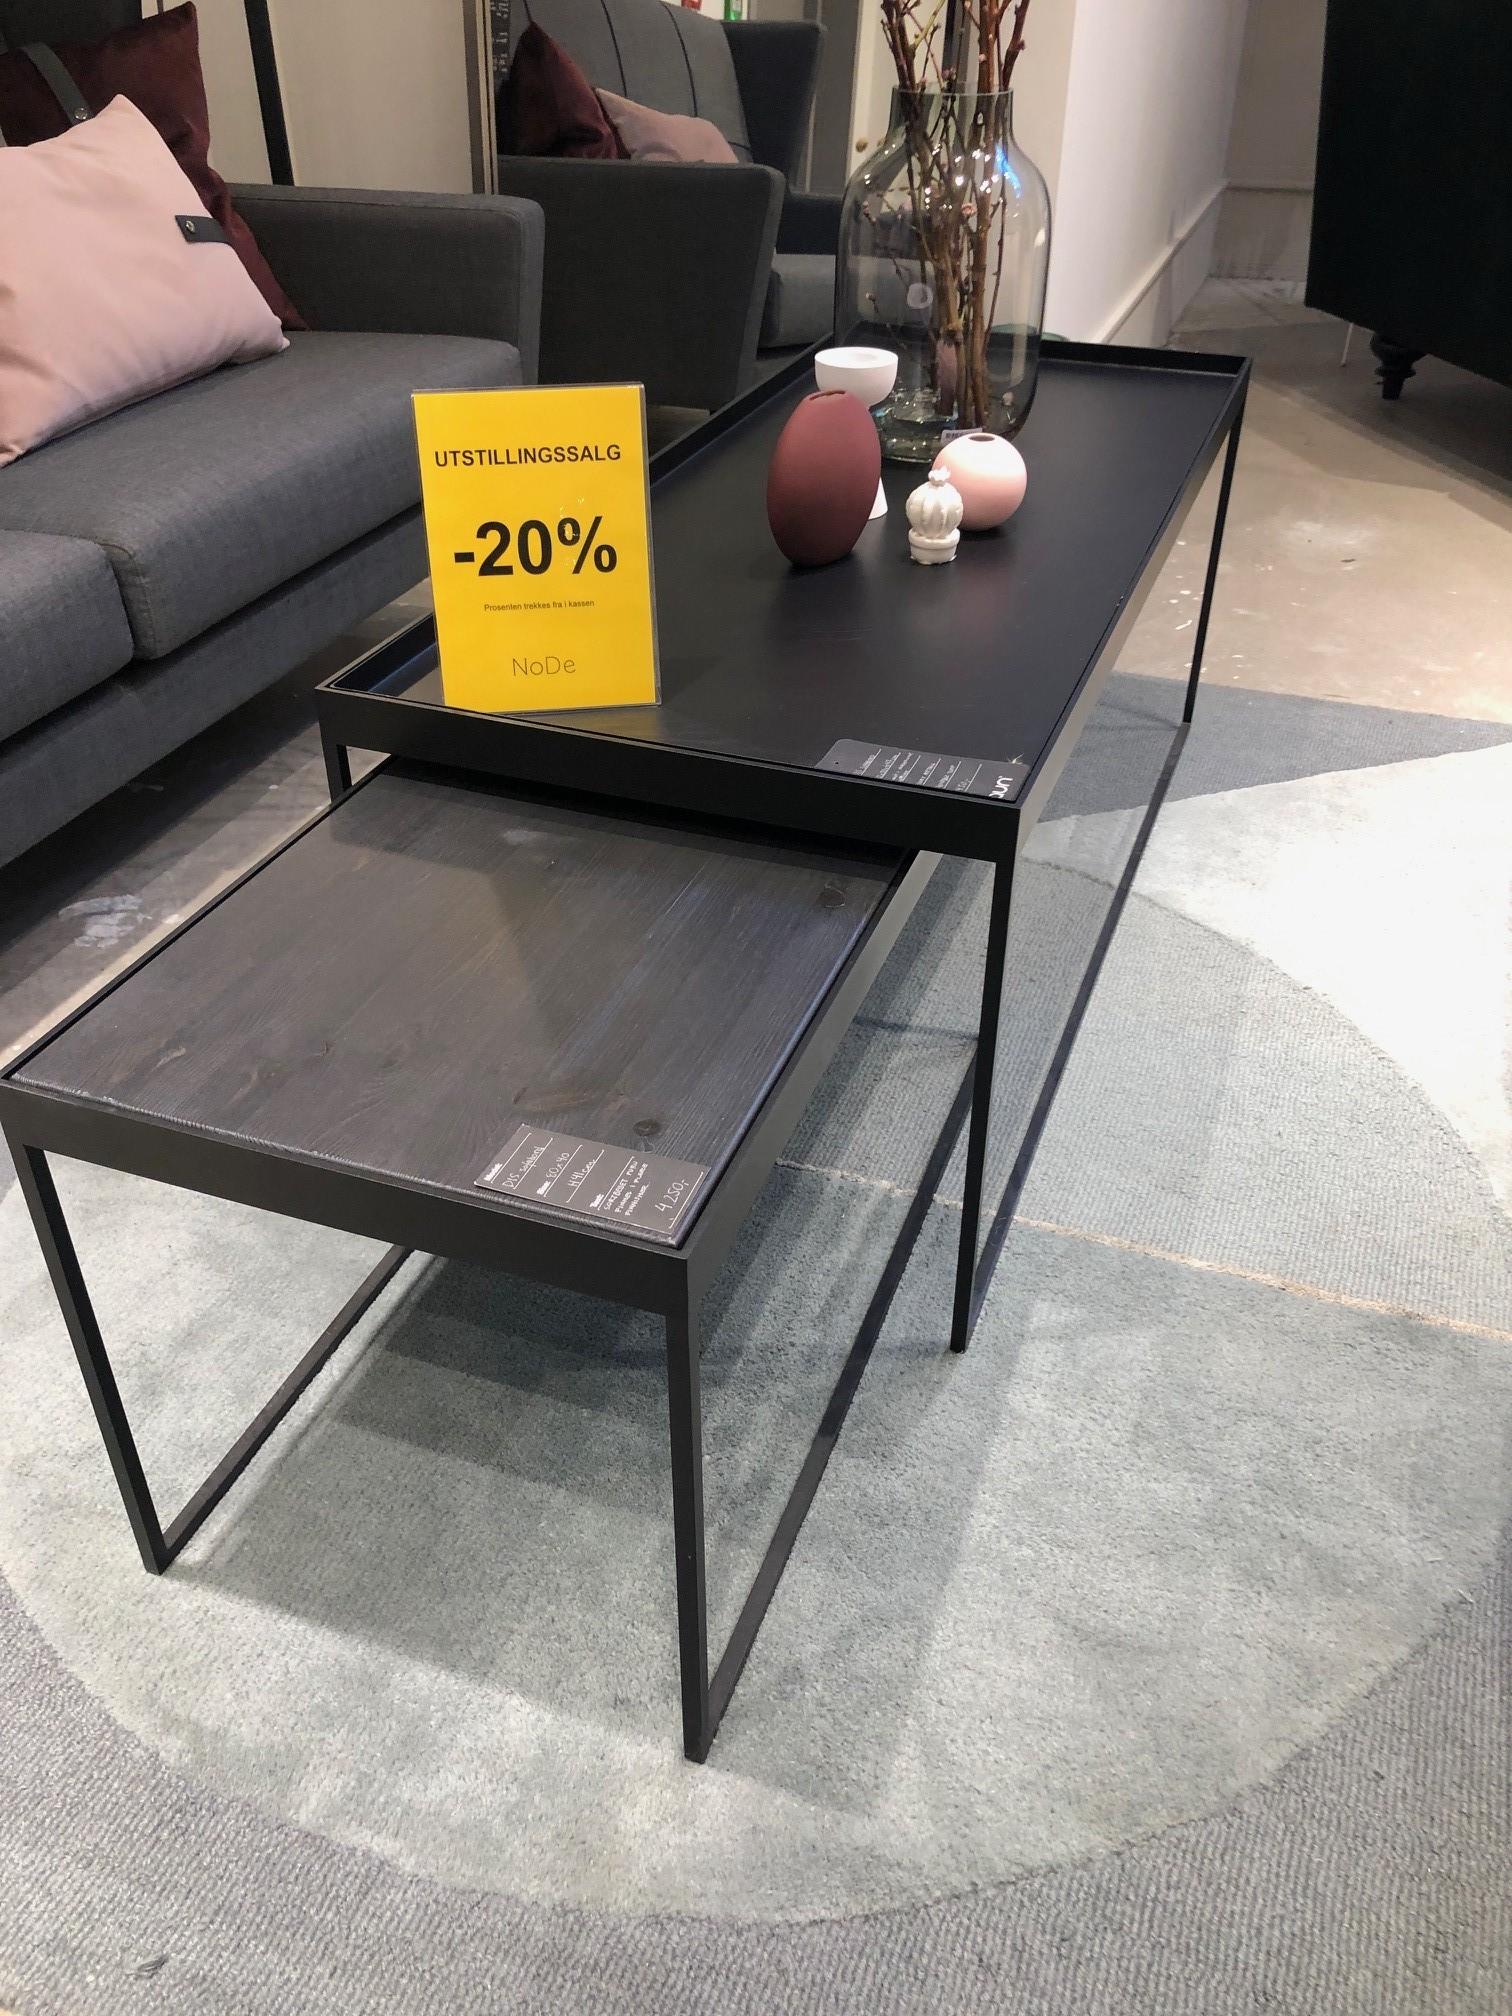 lite bord med furu-topp er solgt